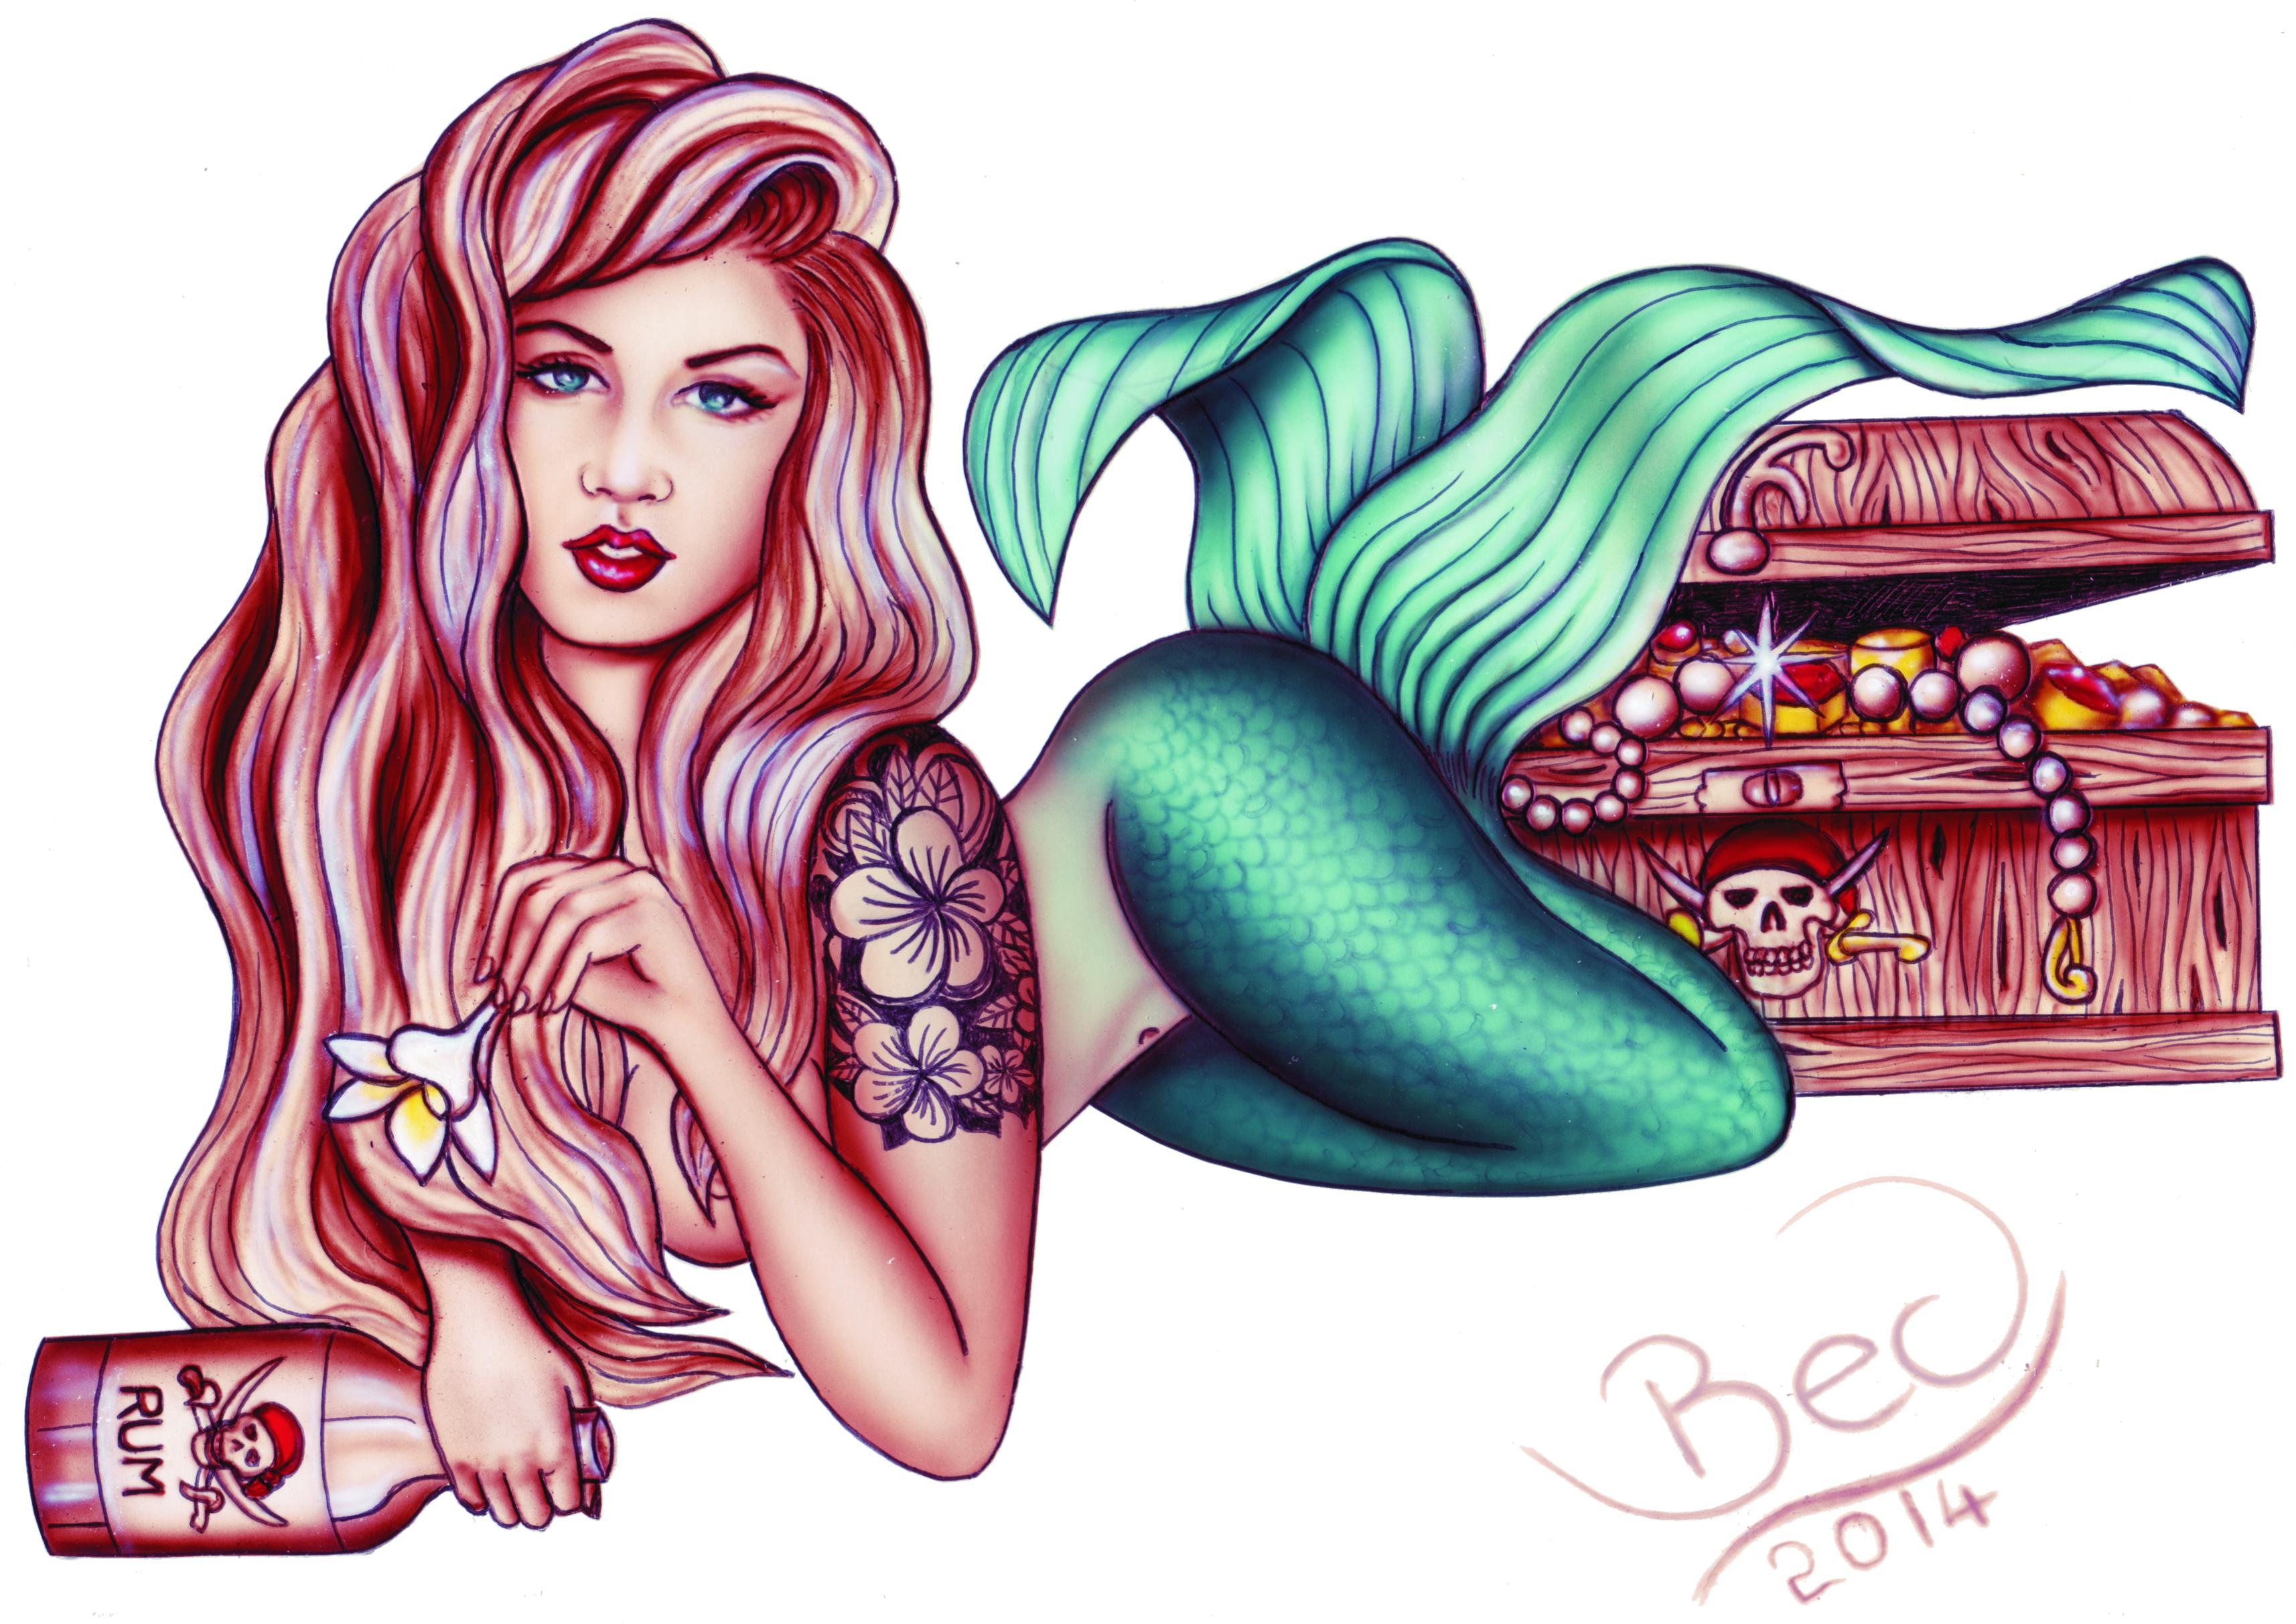 Zexy's tat design - Colour.jpg